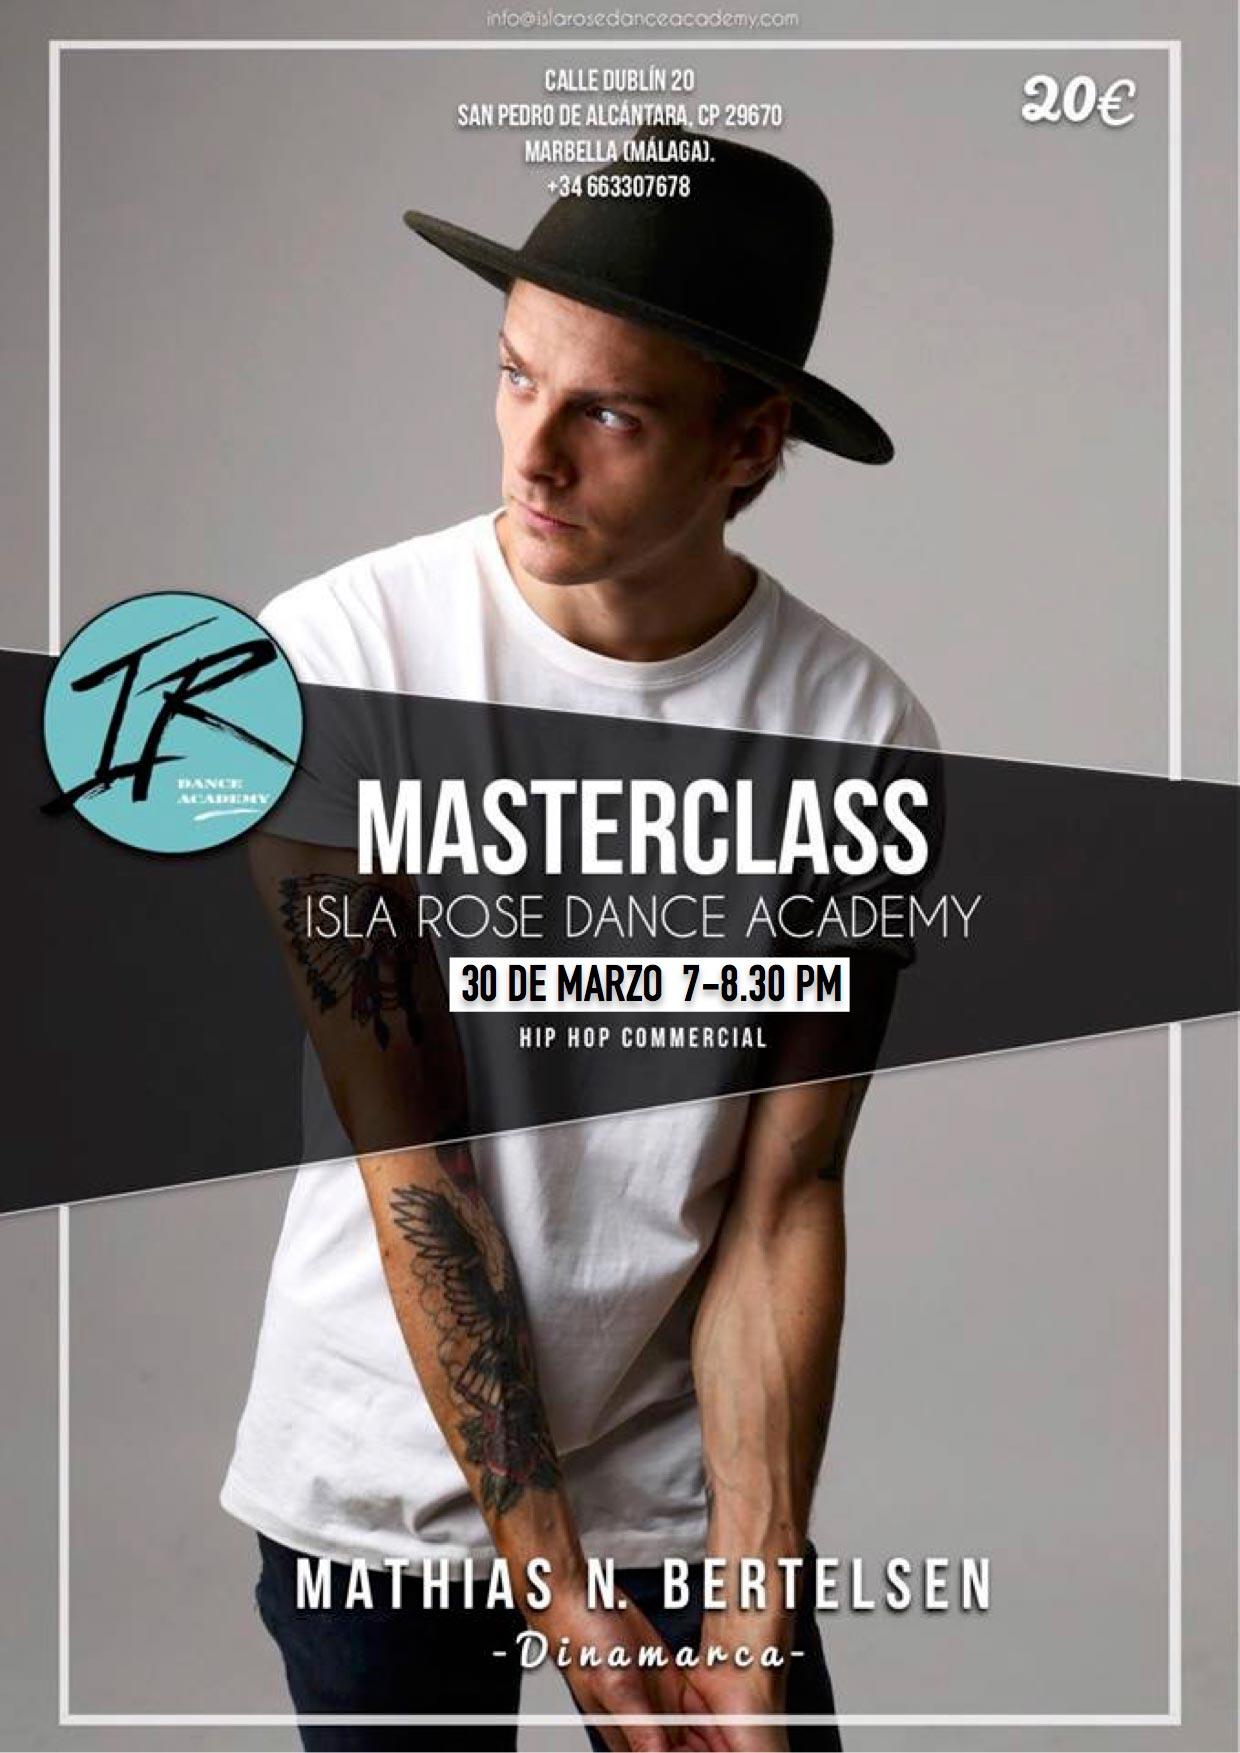 Mathias N Bertelsen - Masterclass Isla Rose Dance Academy